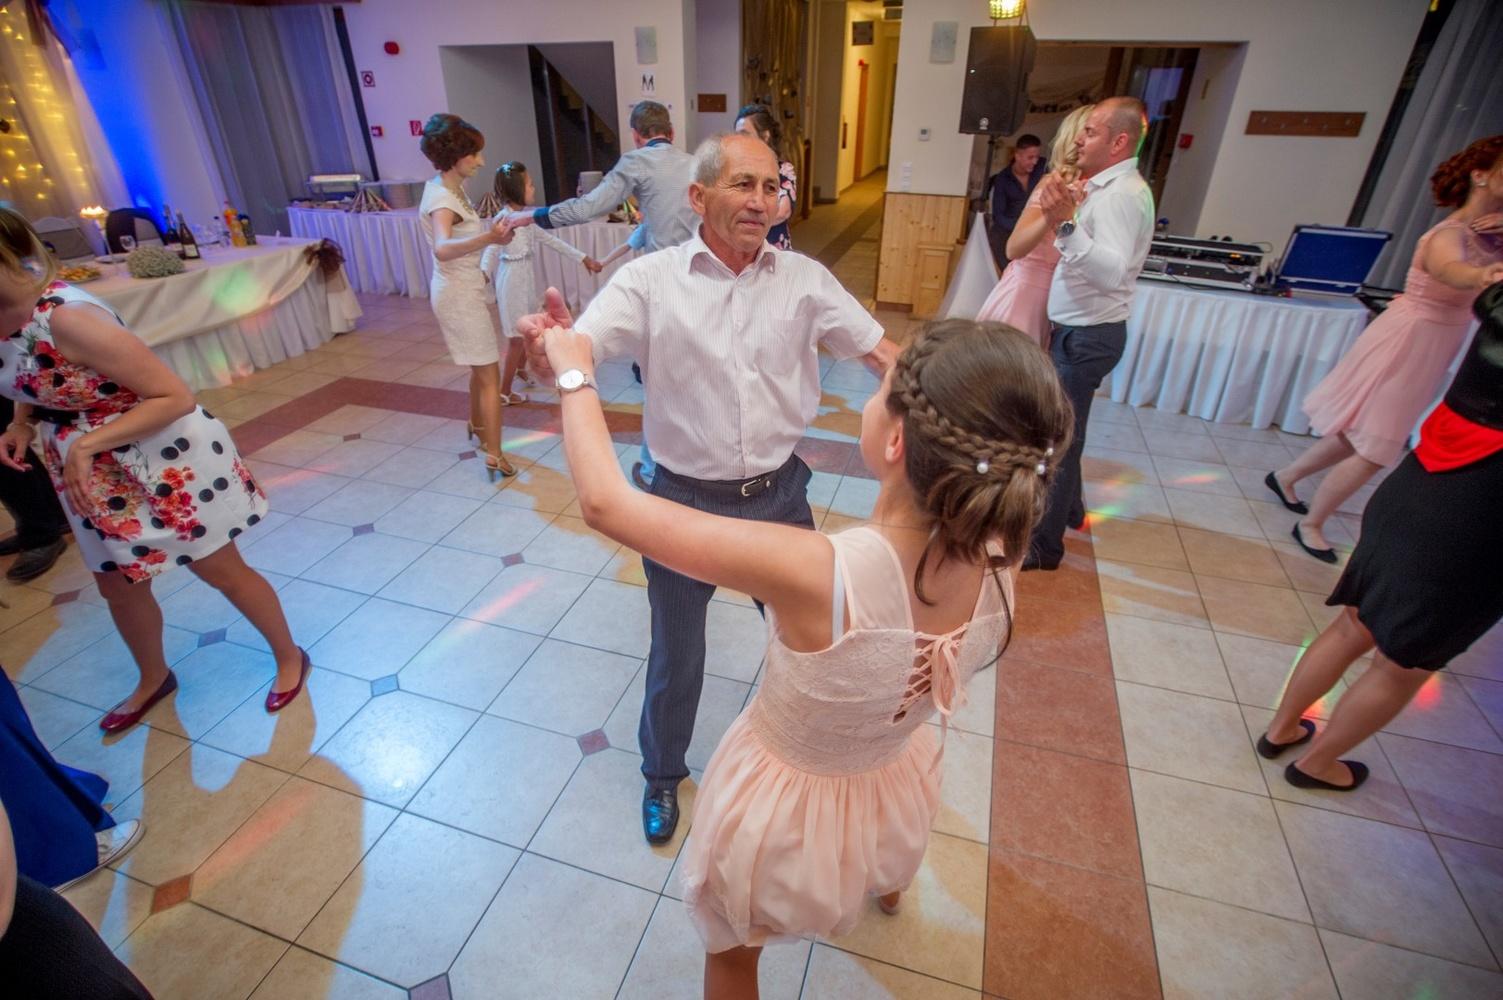 http://www.fotoz.sk/images/gallery-18/normal/eskuvo-fotozas_svadobne-fotenie_592.jpg